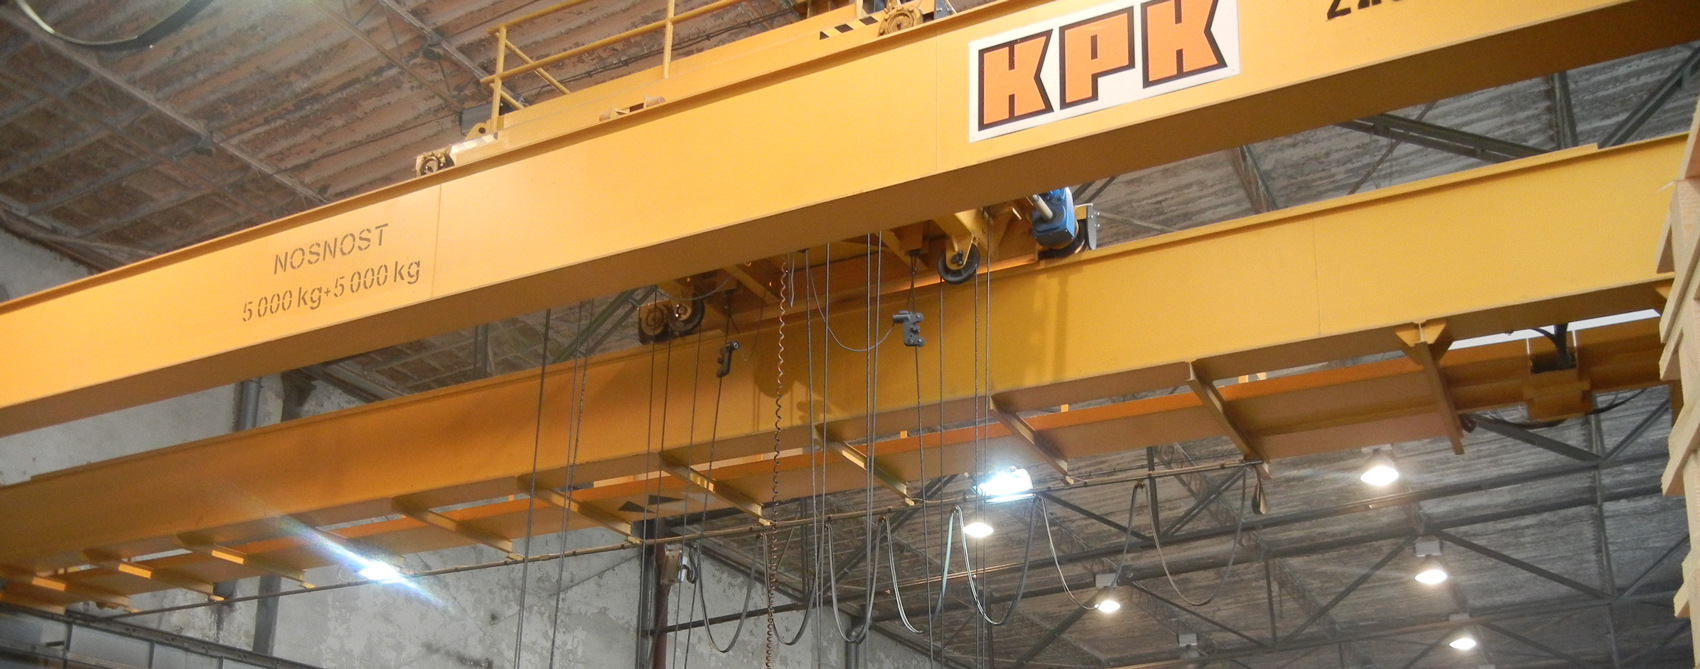 Double girder travelling cranes